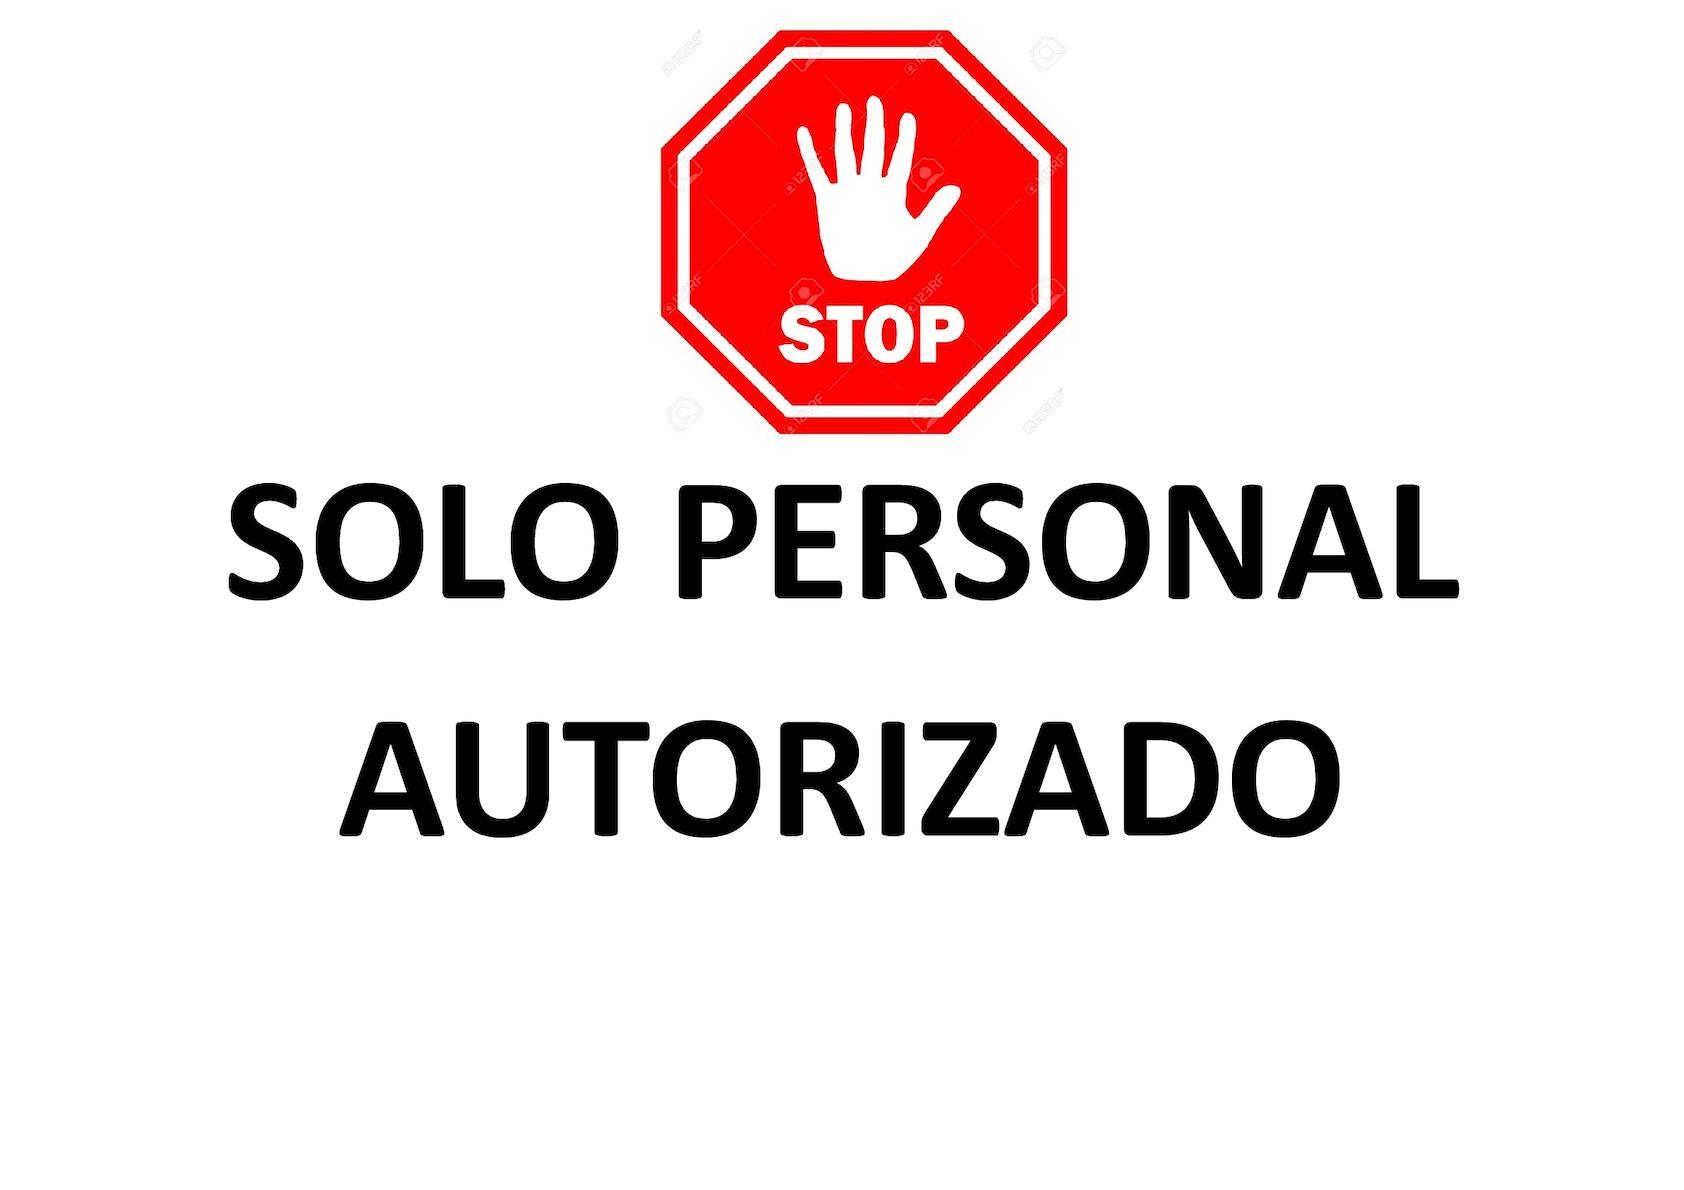 calam o solo personal autorizado